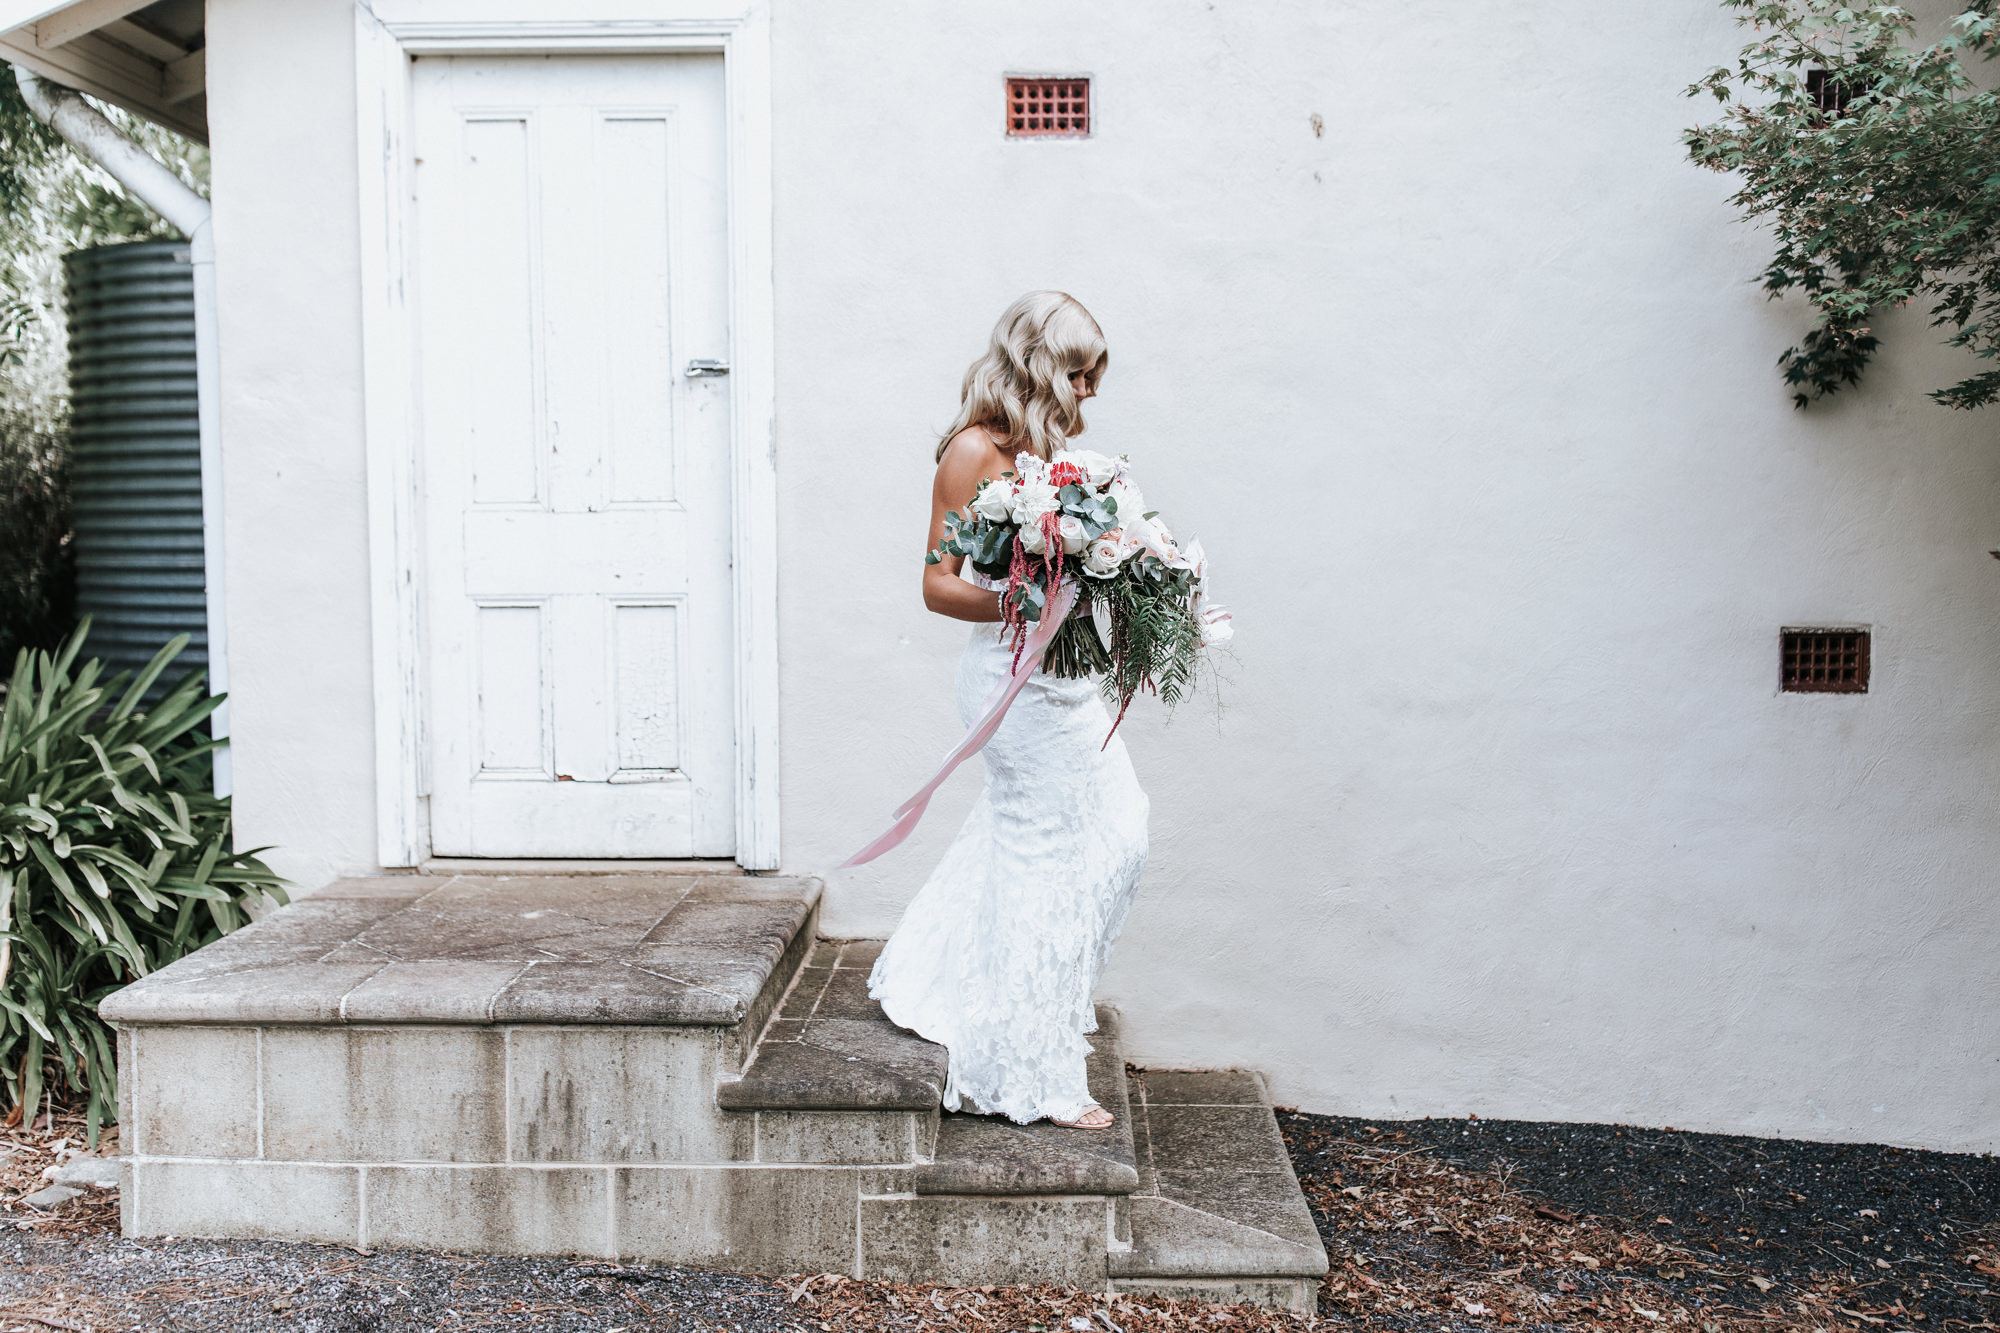 mali-brae-wedding-natalie-scott-baldwin-5.jpg